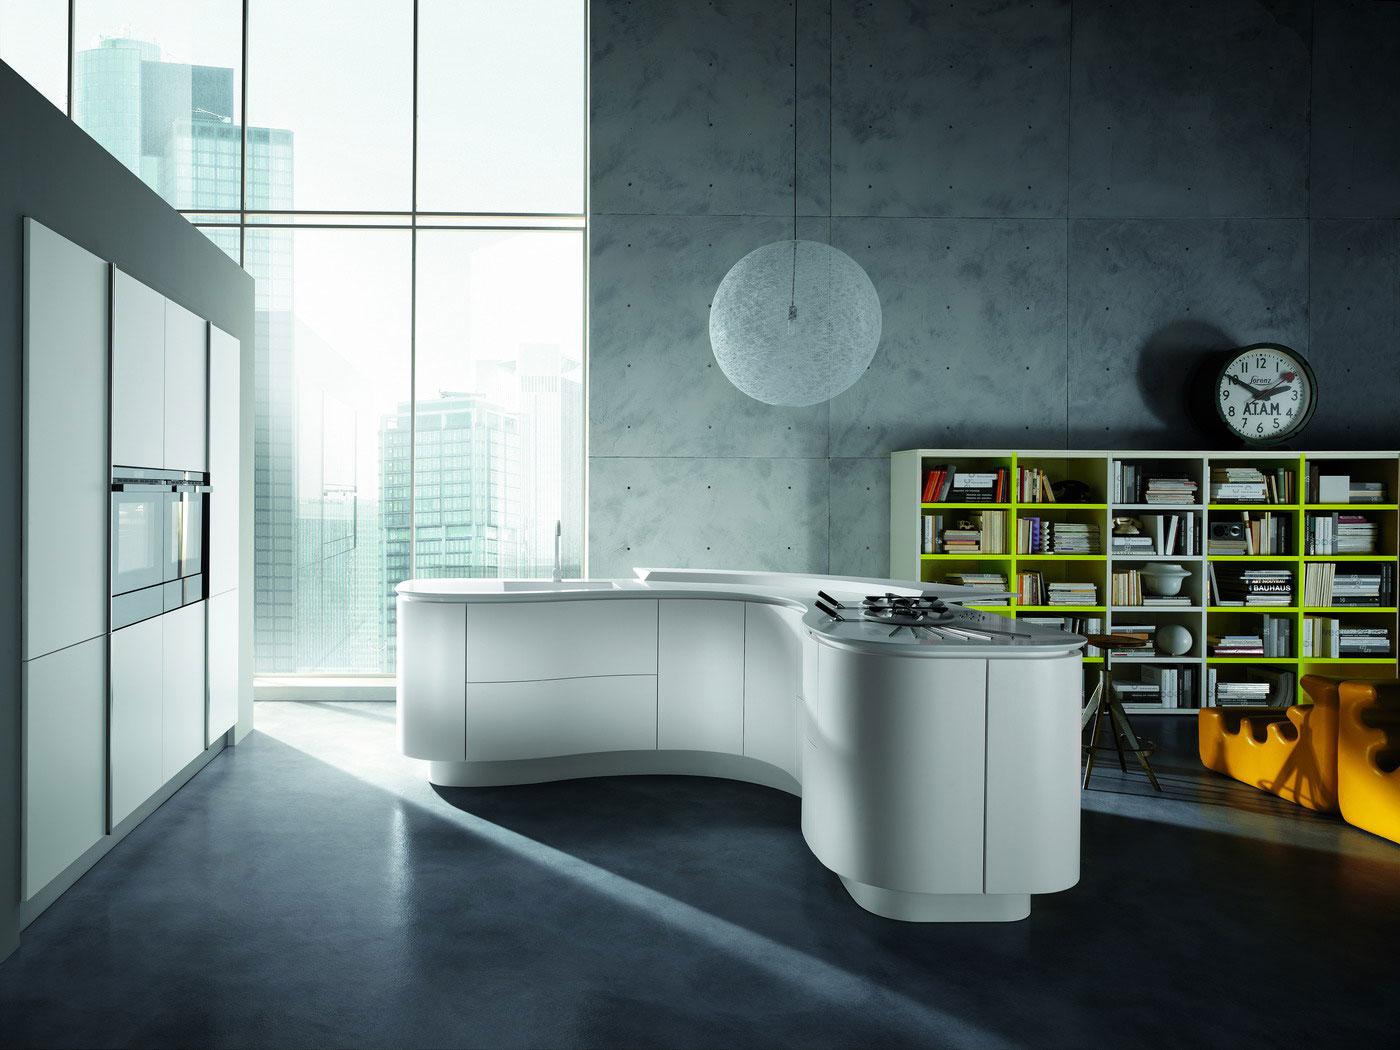 cuisines-nord-isere.fr/modeles/mt-700/11